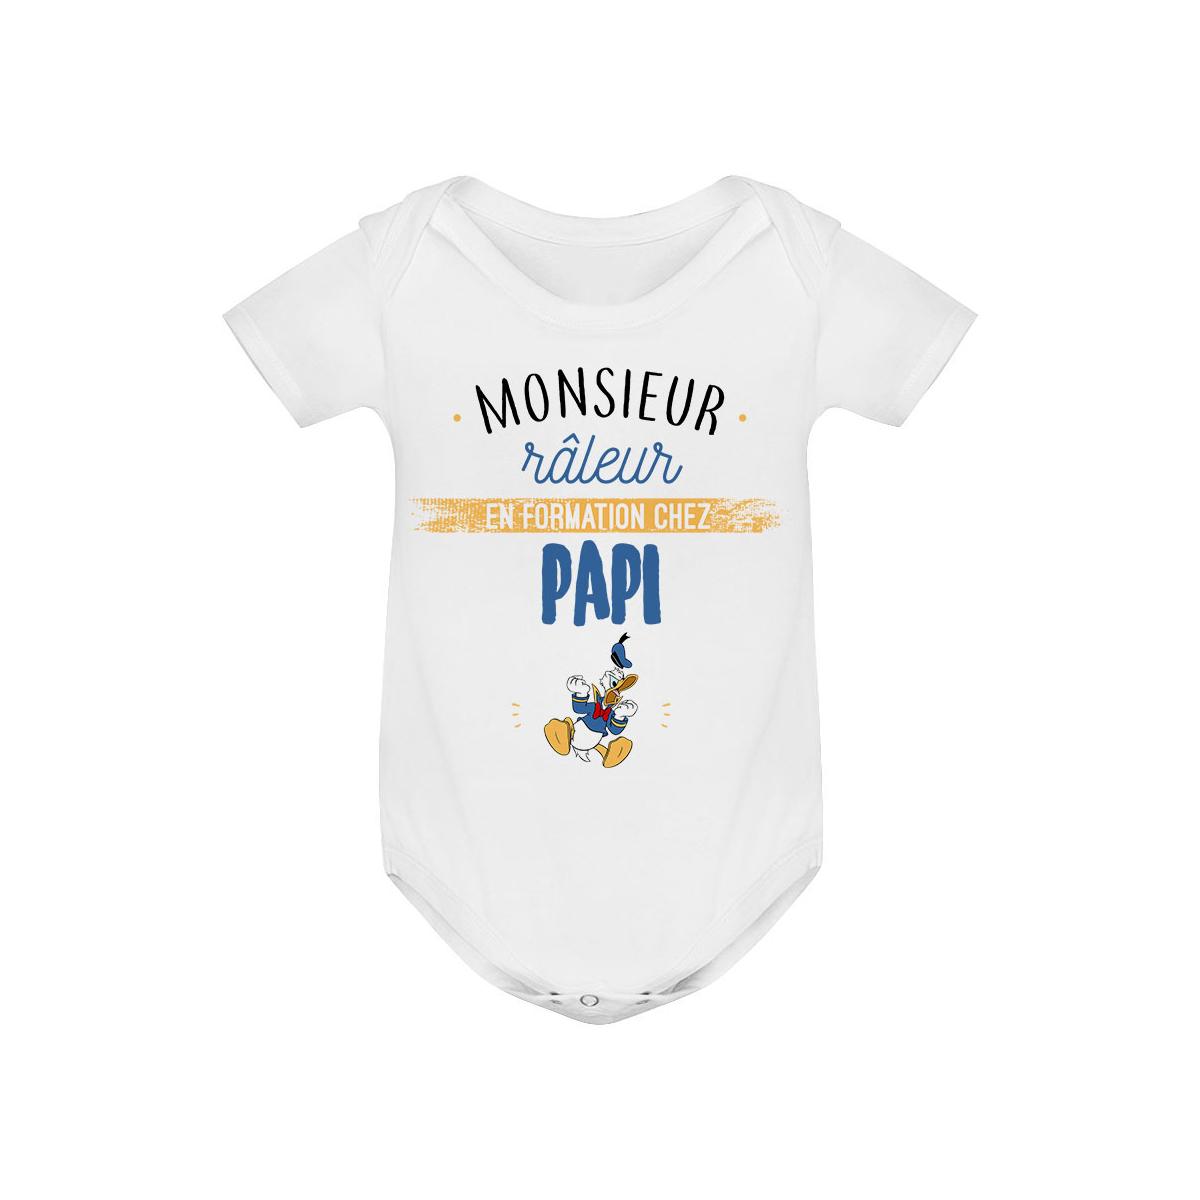 Body bébé Monsieur râleur - Papy